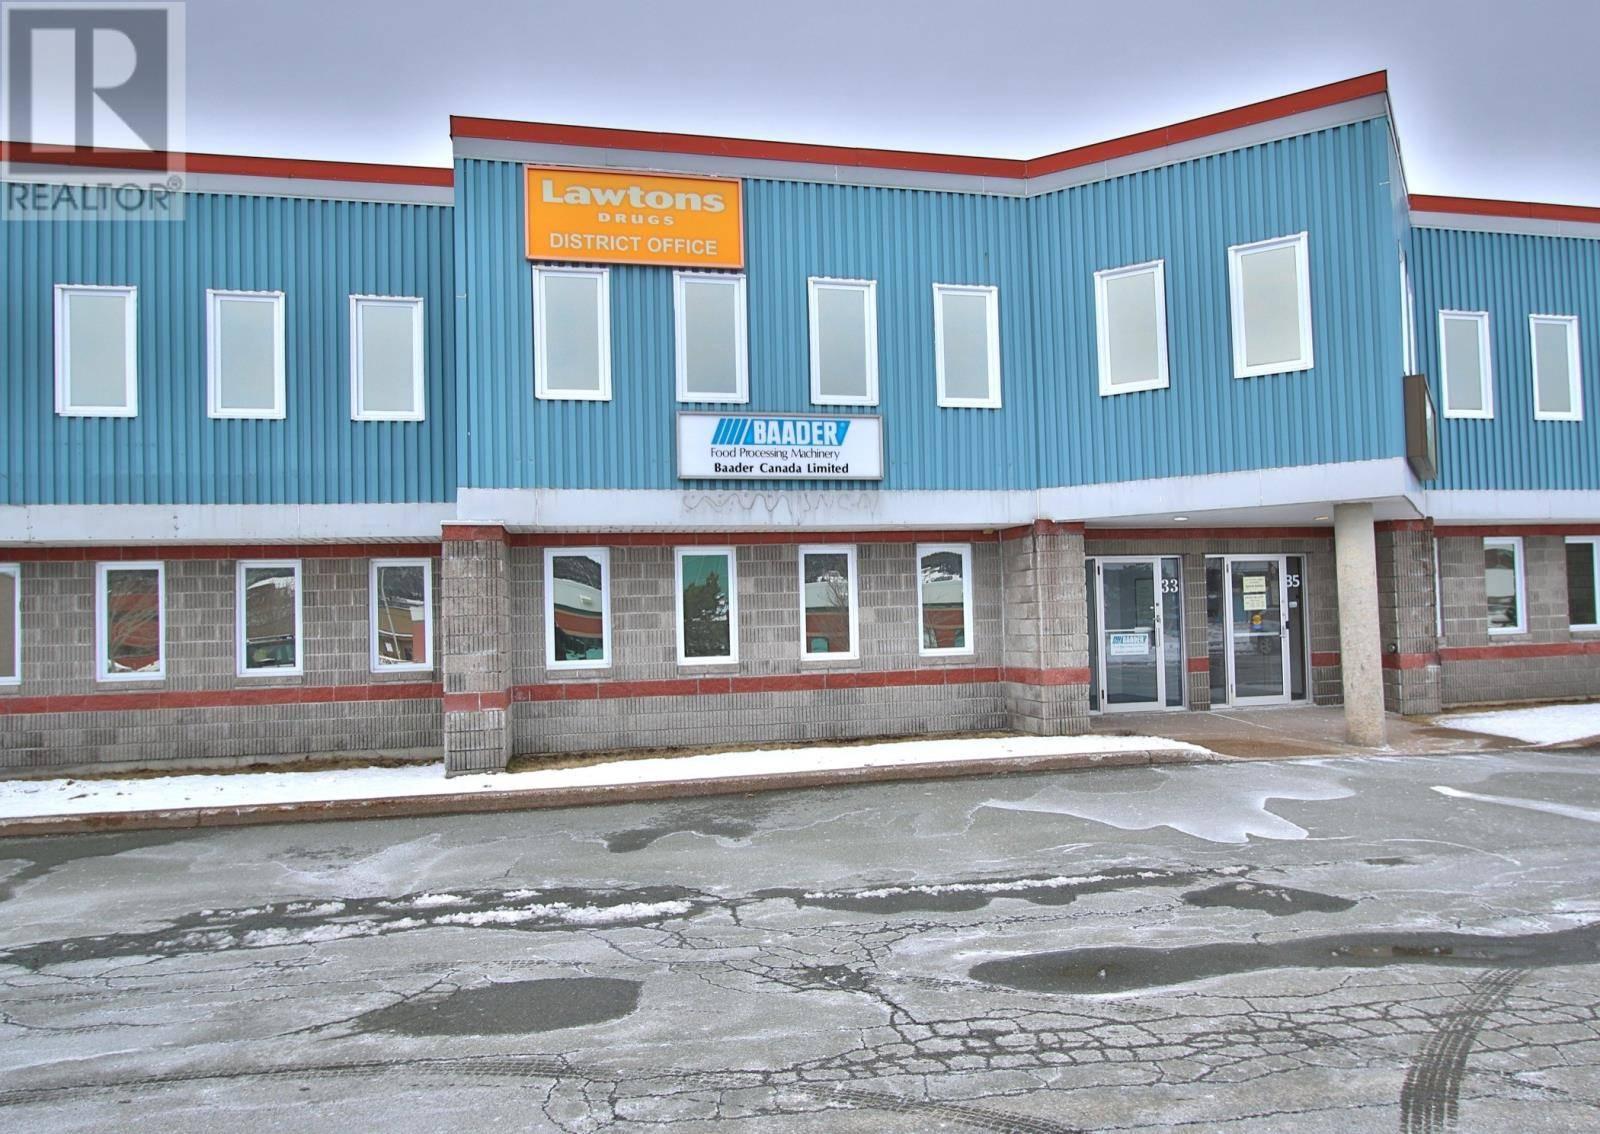 Property for rent at 25 Hallett Cres Unit 2 St. John's Newfoundland - MLS: 1196981